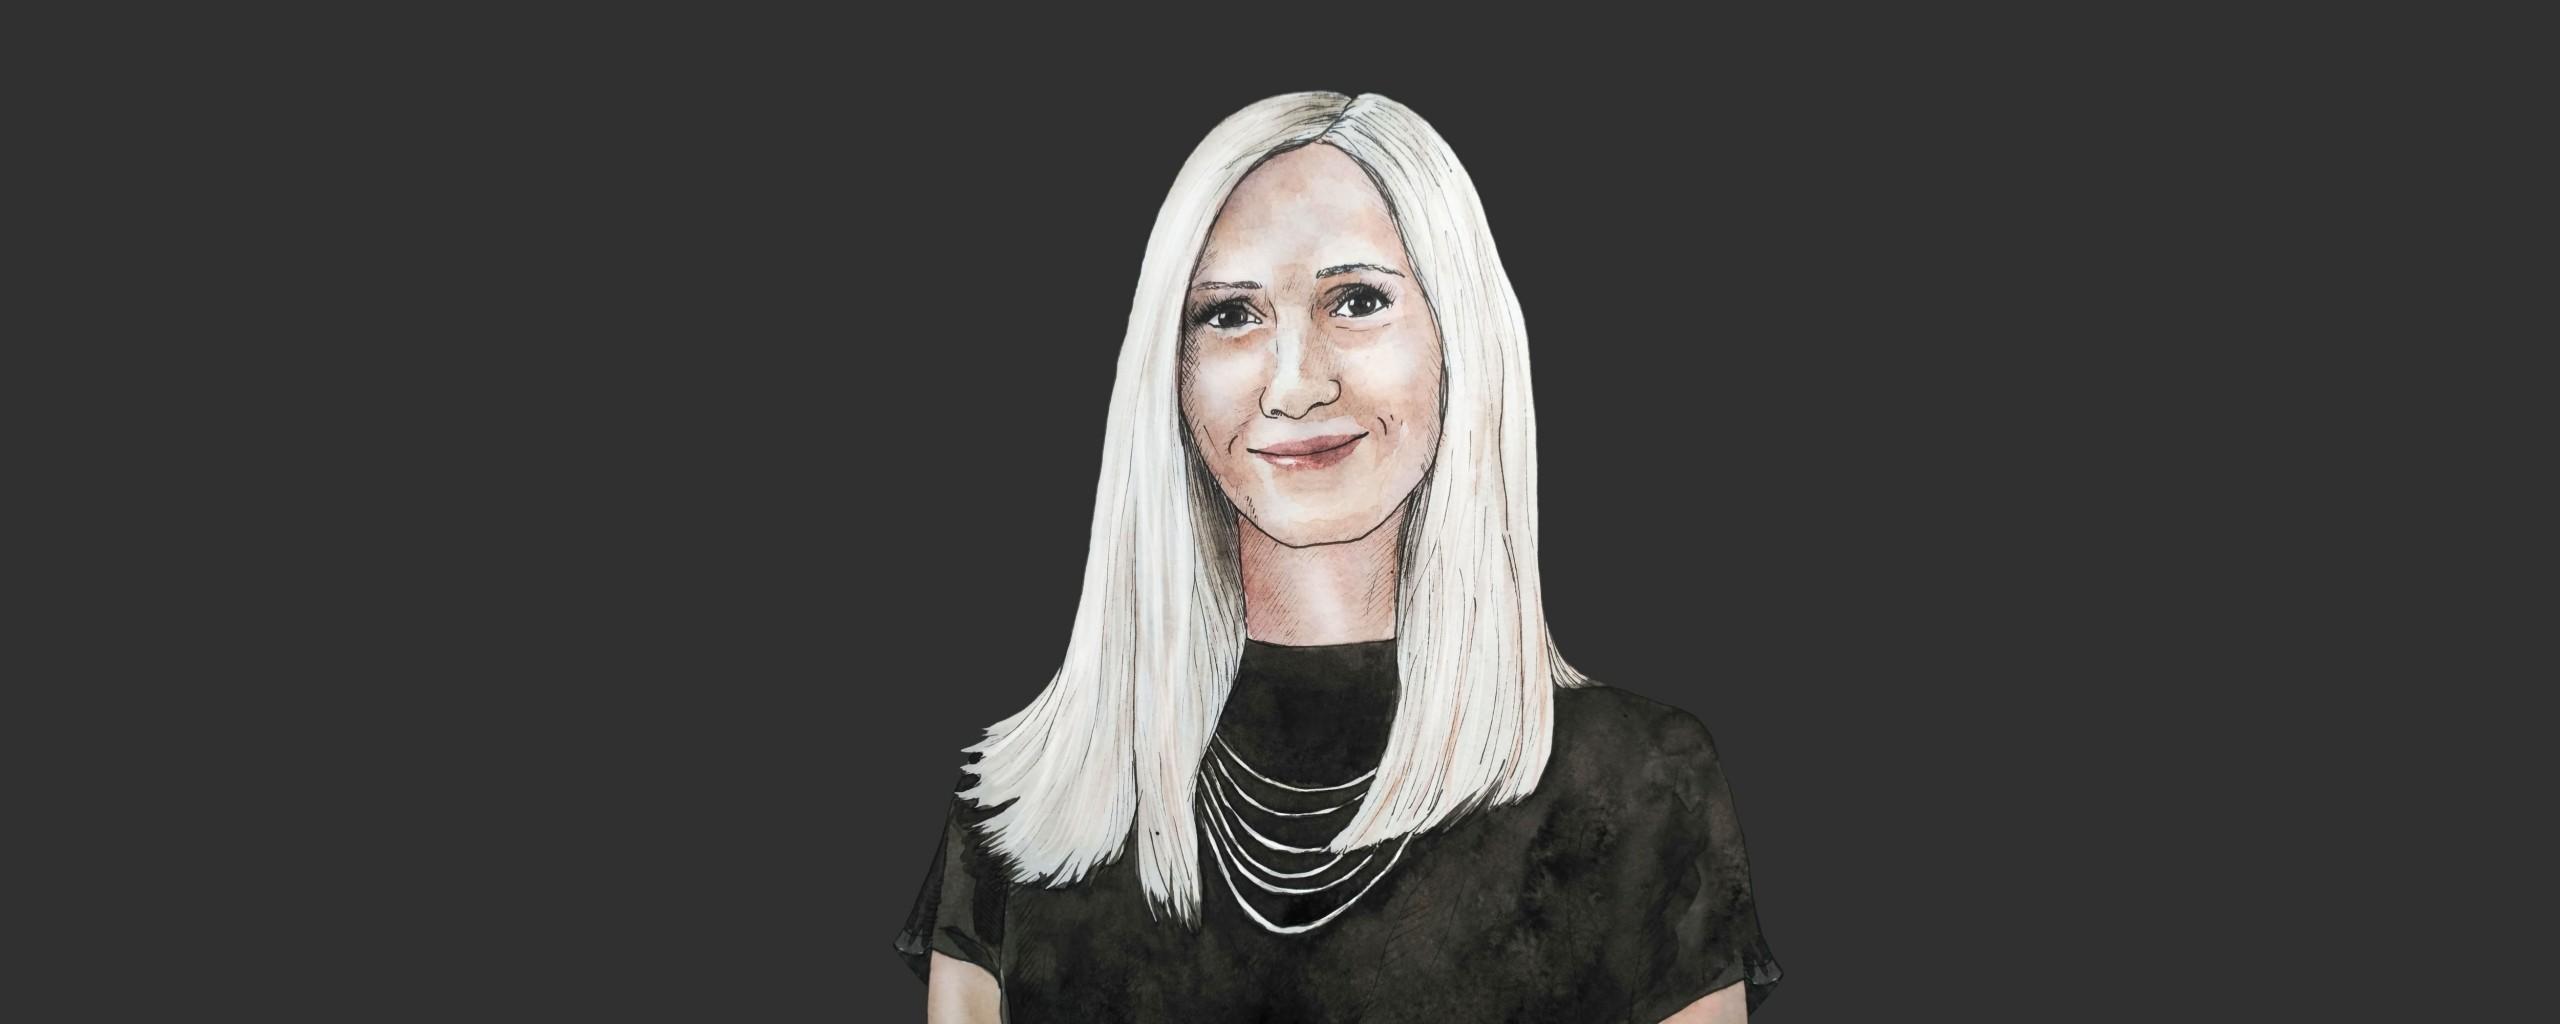 Illustrated portrait of Carina Linmeier